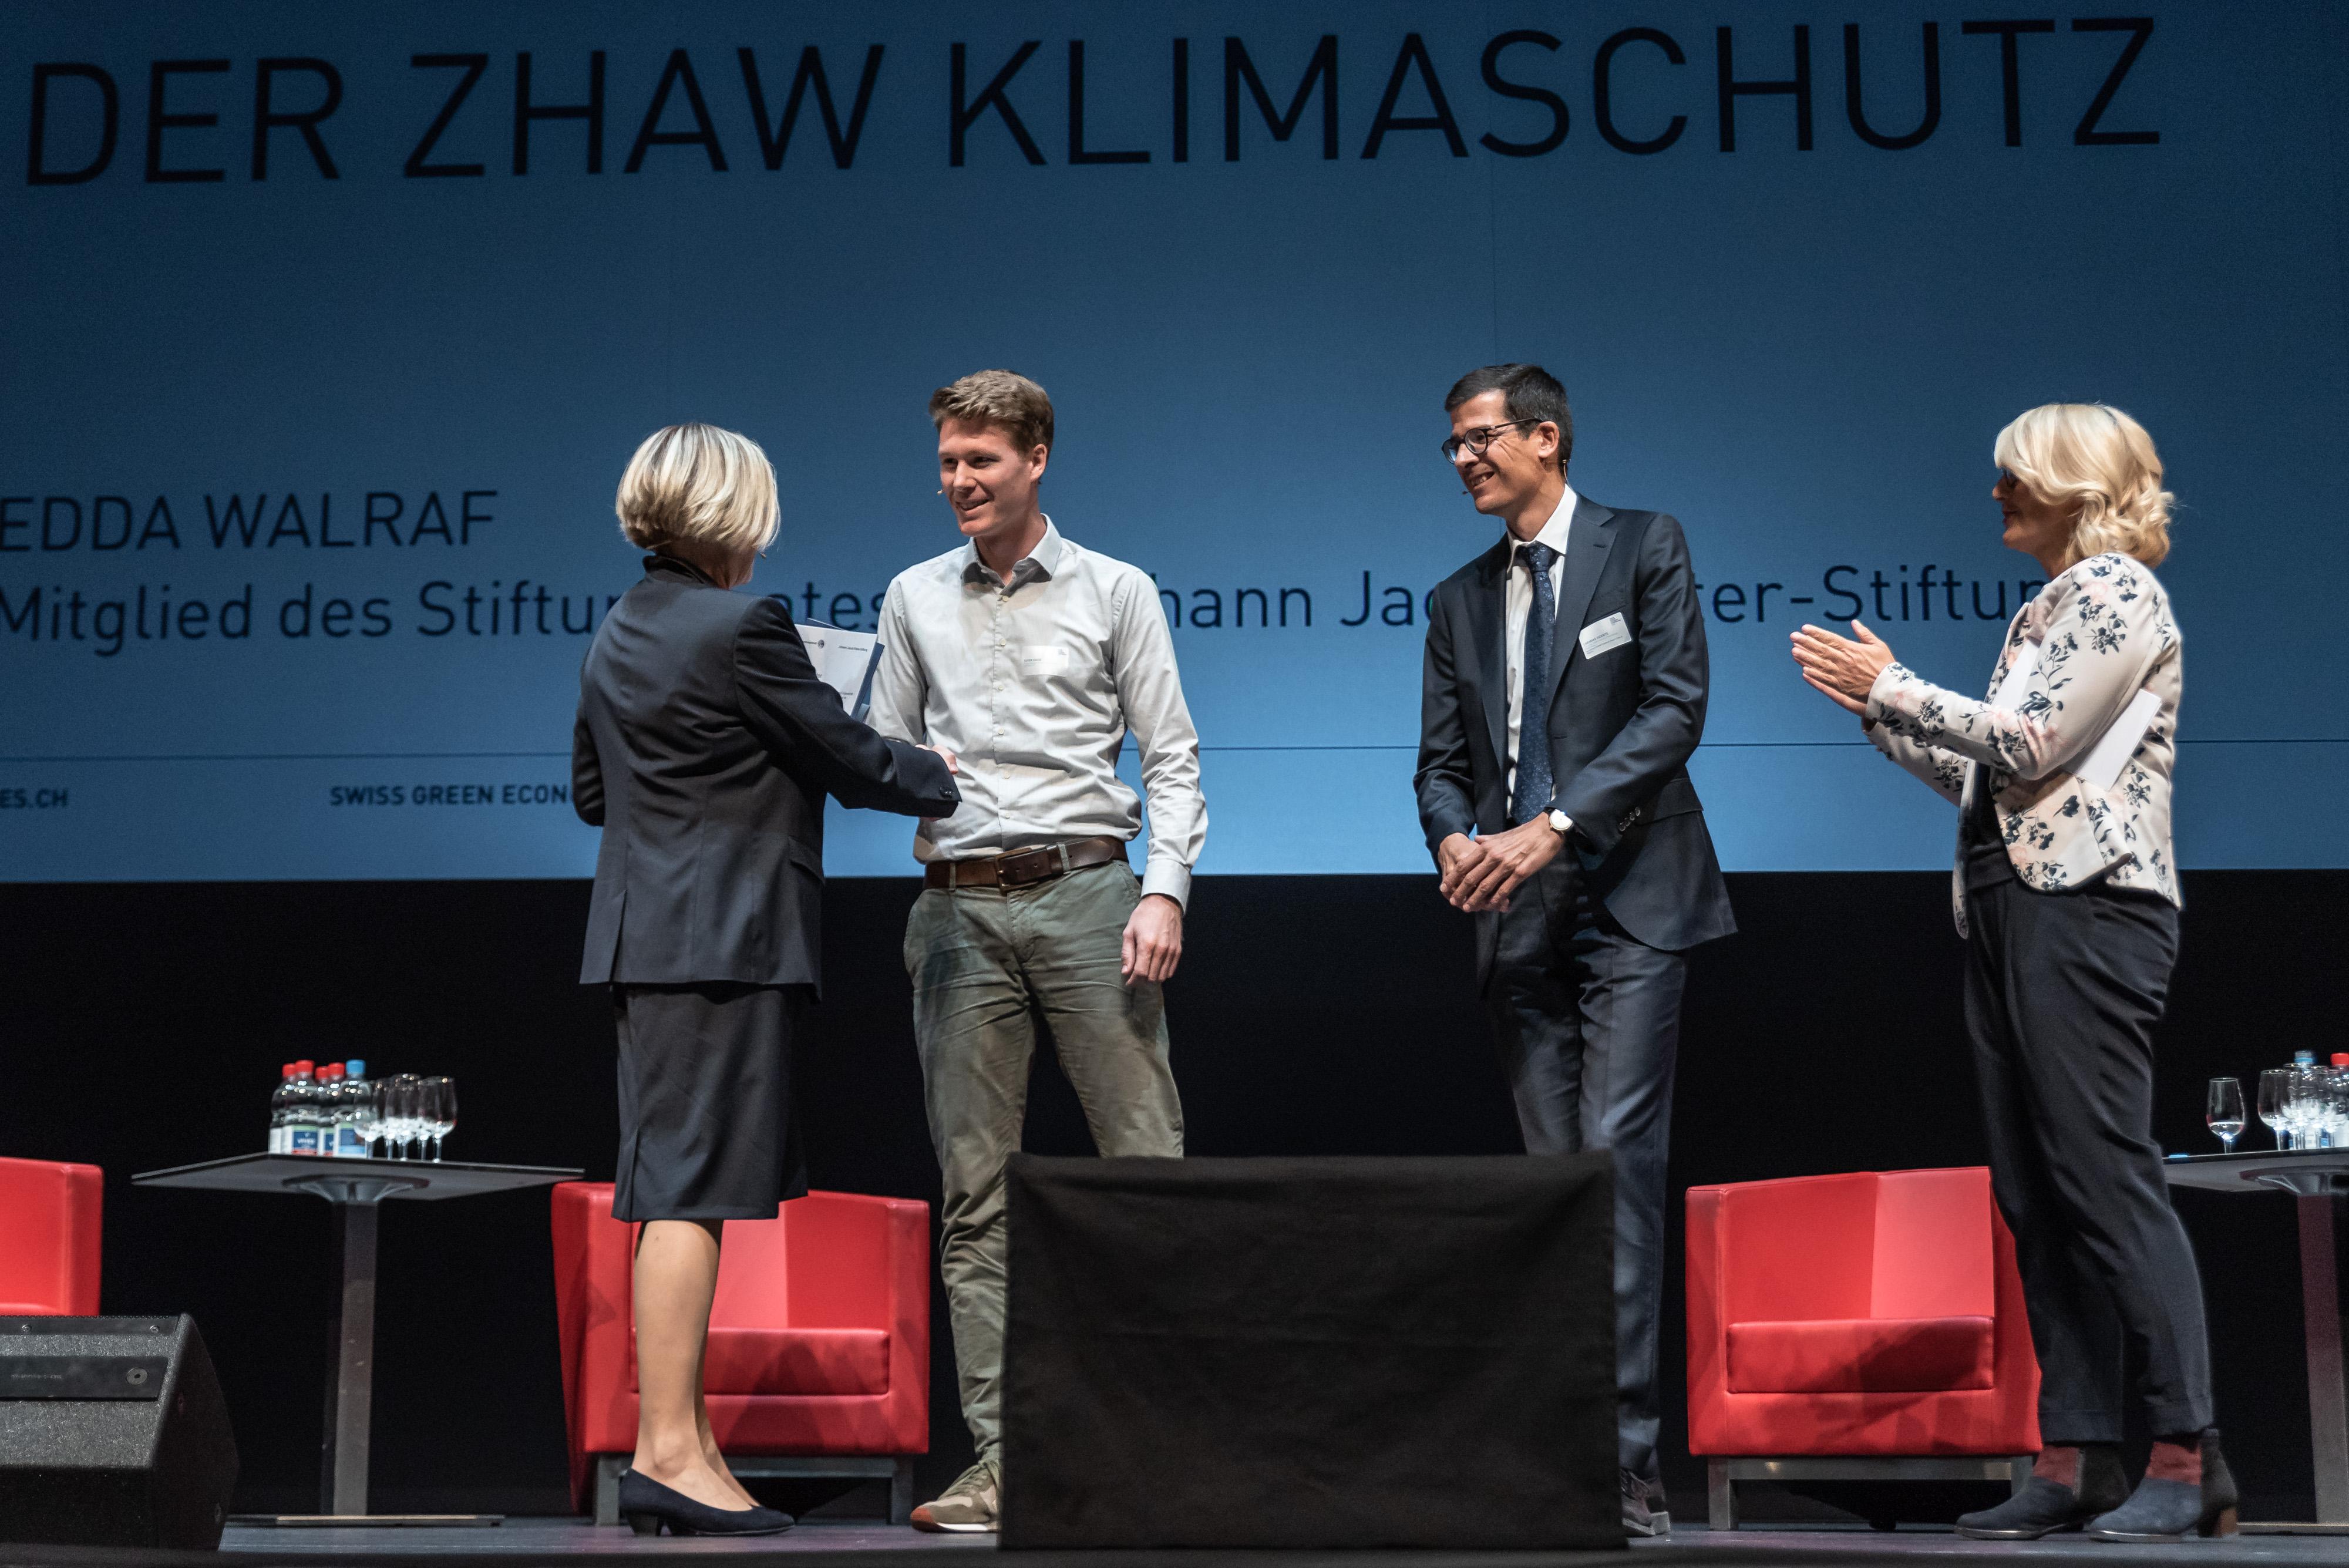 SGES 2018 Preisverleihung Beste Bachelor/Masterarbeit ZHAW